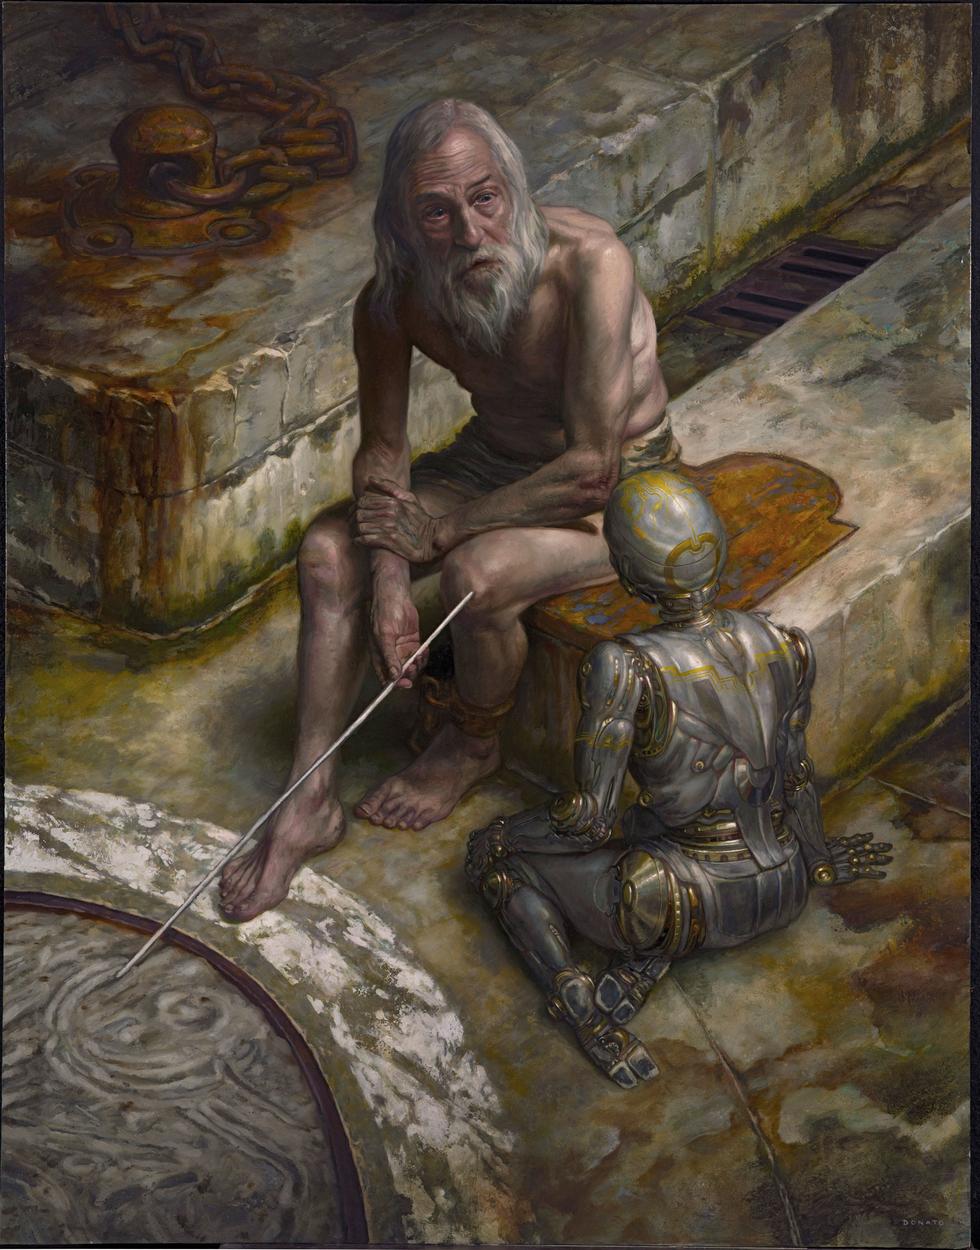 Prometheus, A.I. Artwork by Donato Giancola